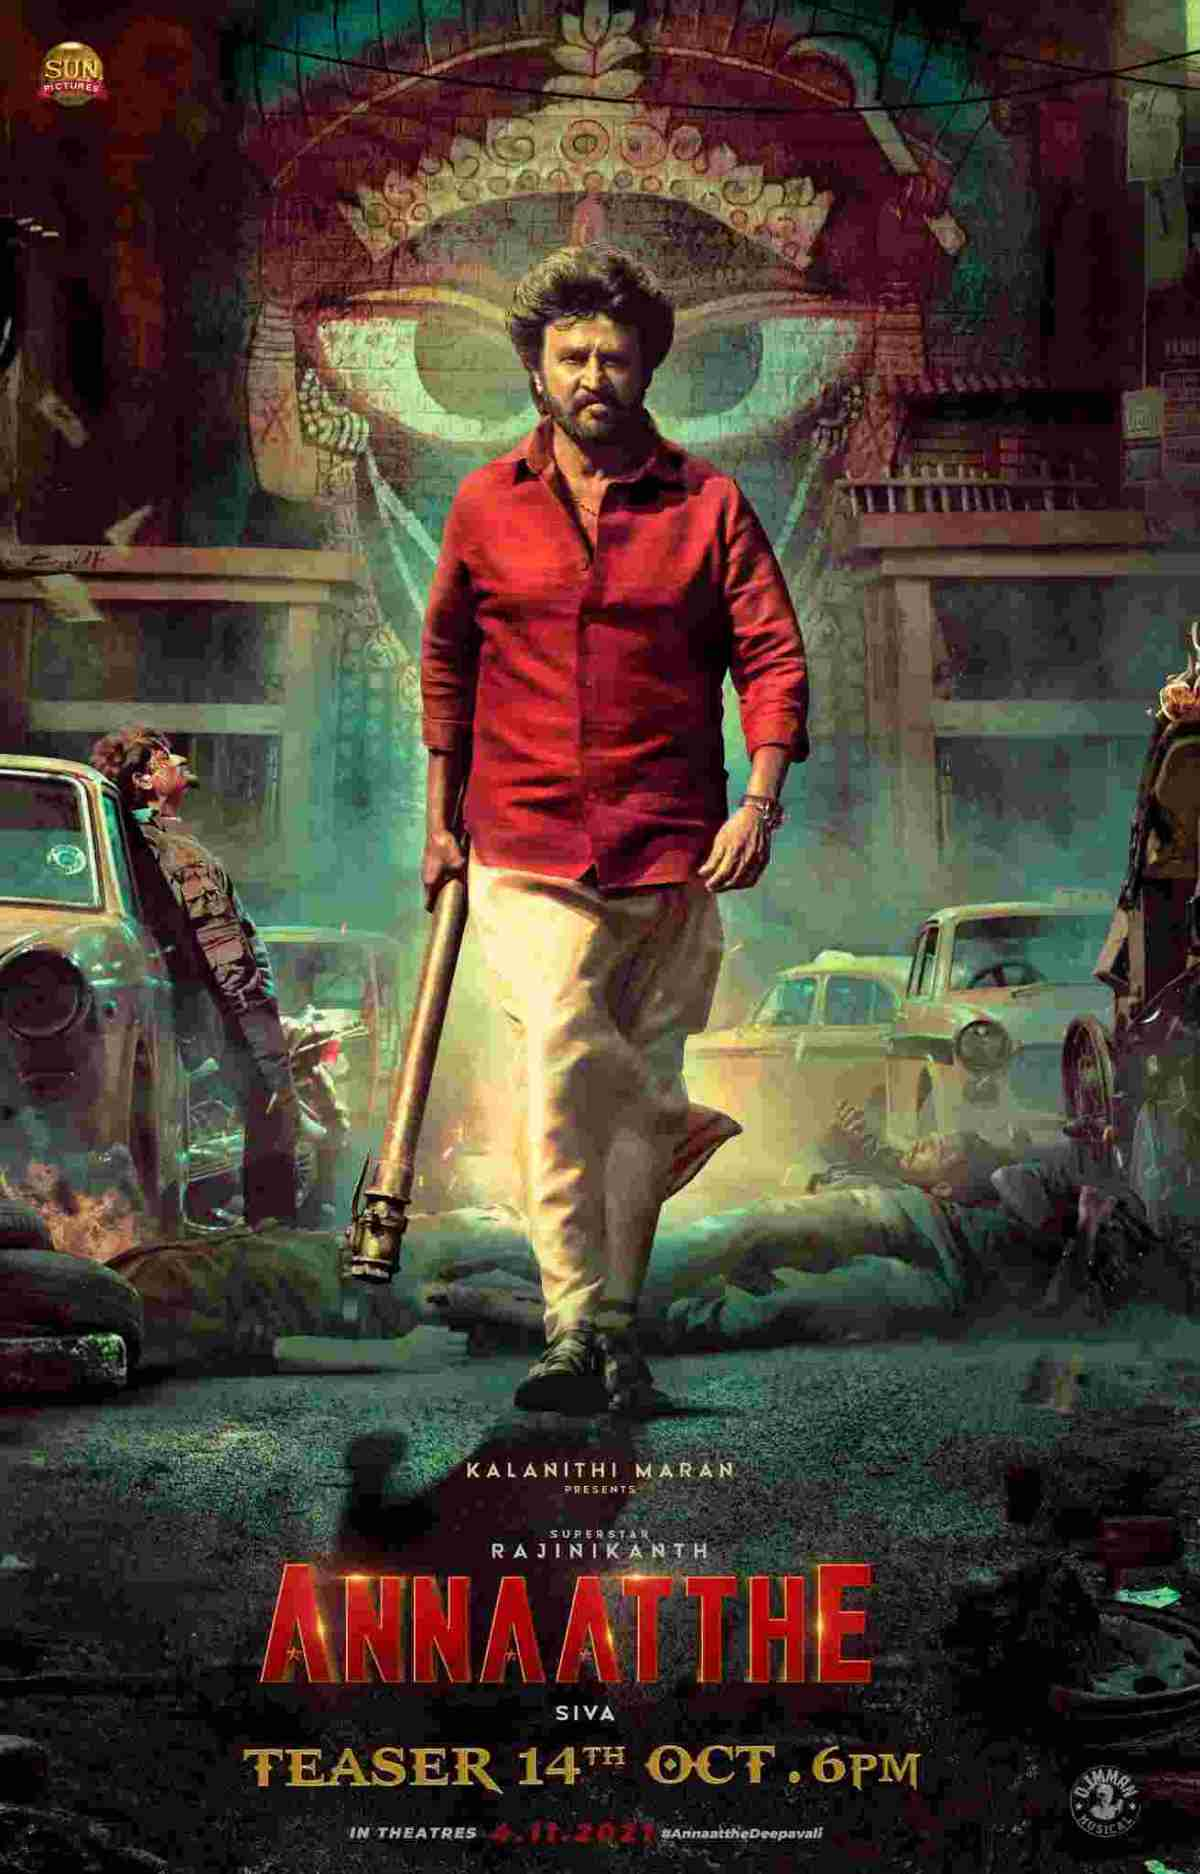 Annaatthe Official Teaser featuring Rajinikanth Nayanthara